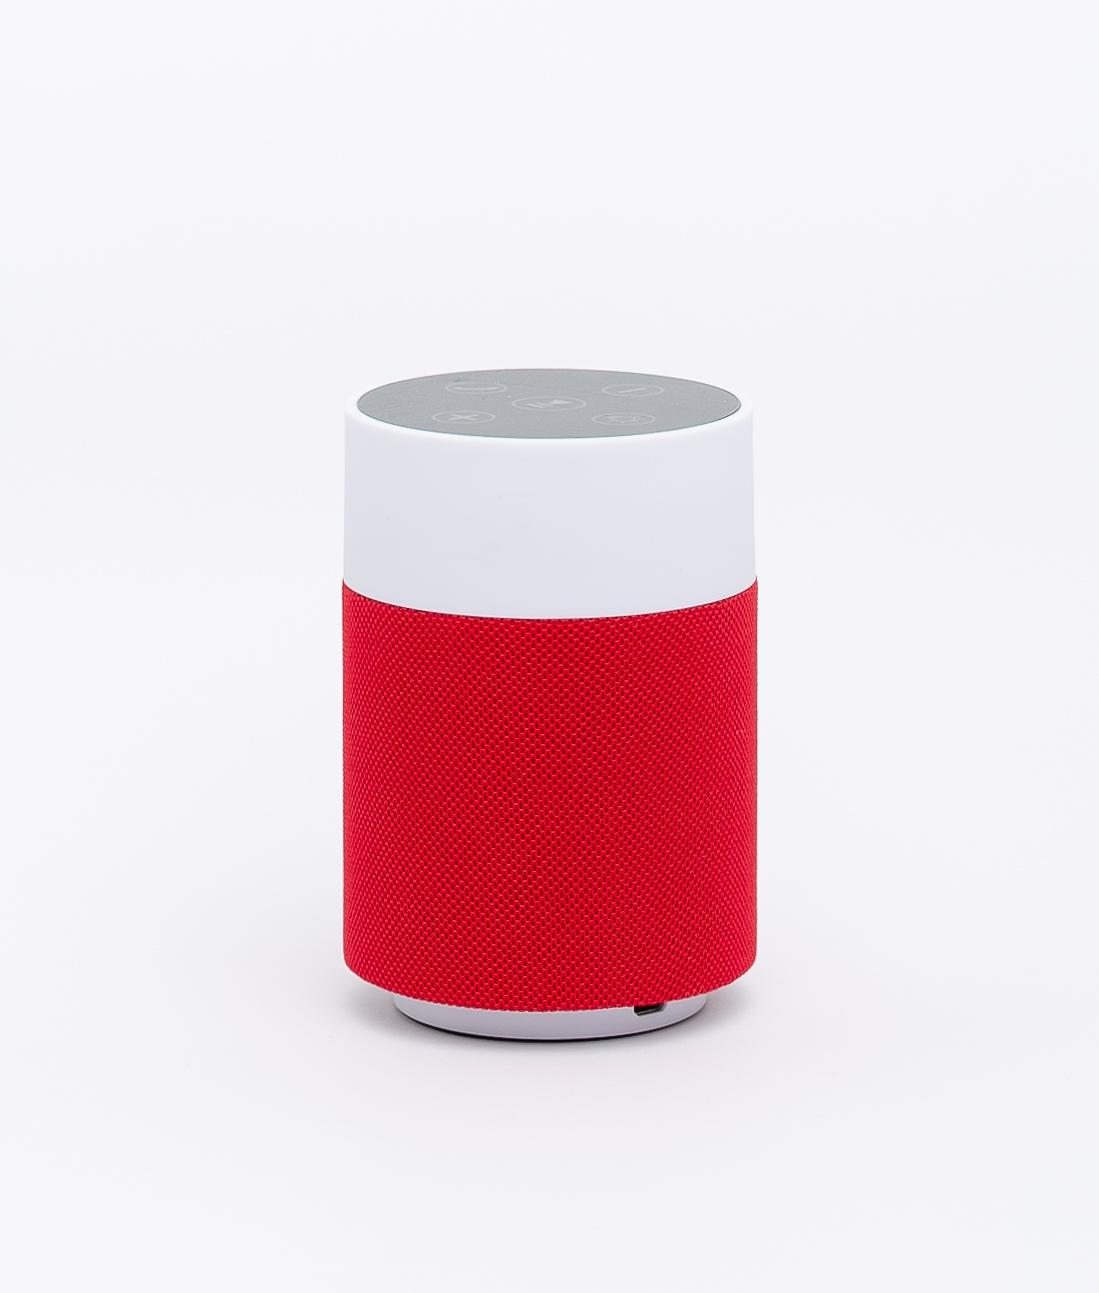 Haut-parleur Bluetooth Abacus - Rouge